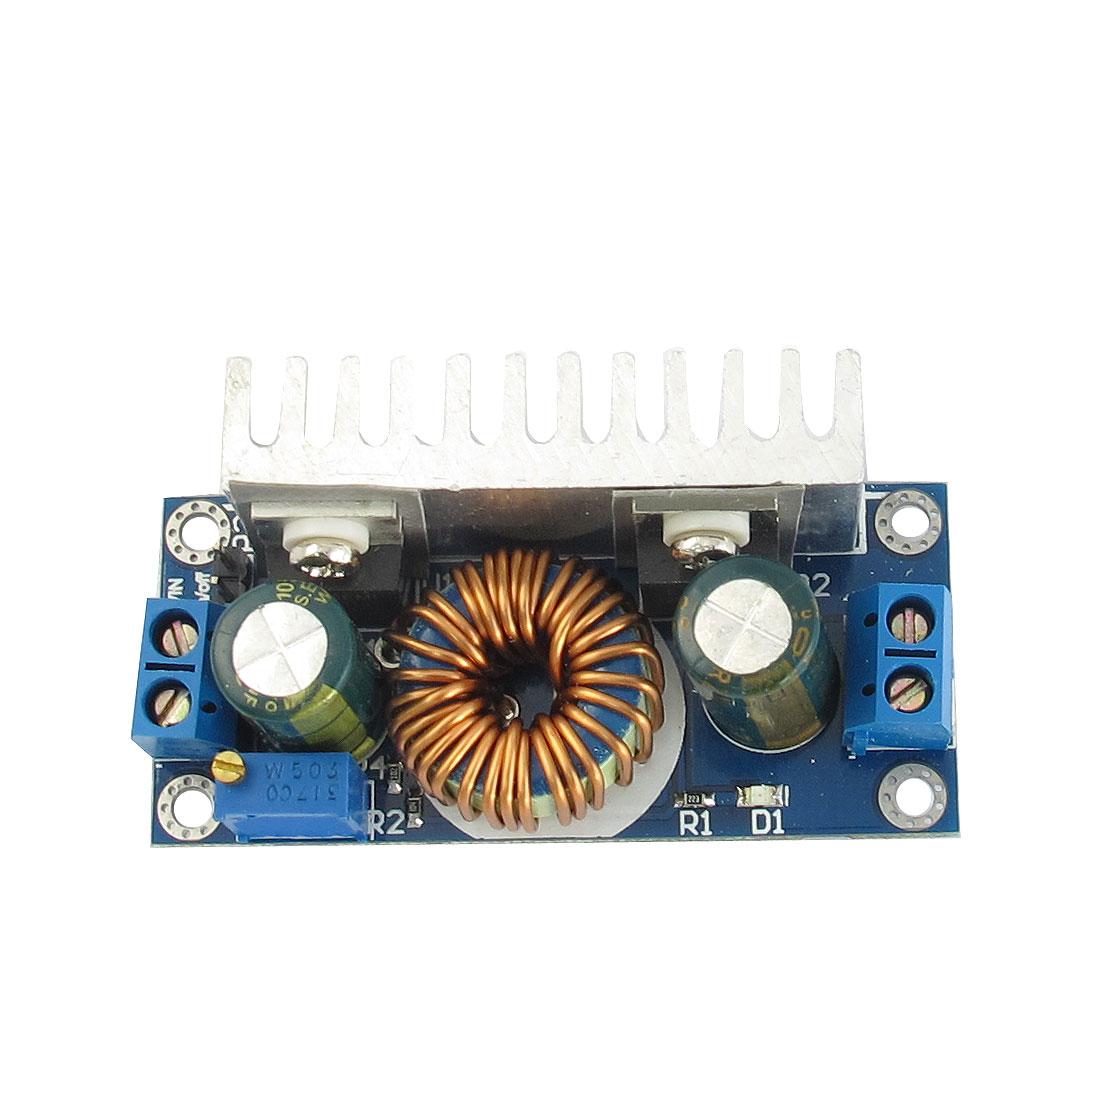 DC-DC 24V to 12V 8A Voltage Regulator Converter Heatsink Step Down Power Module PCB Board